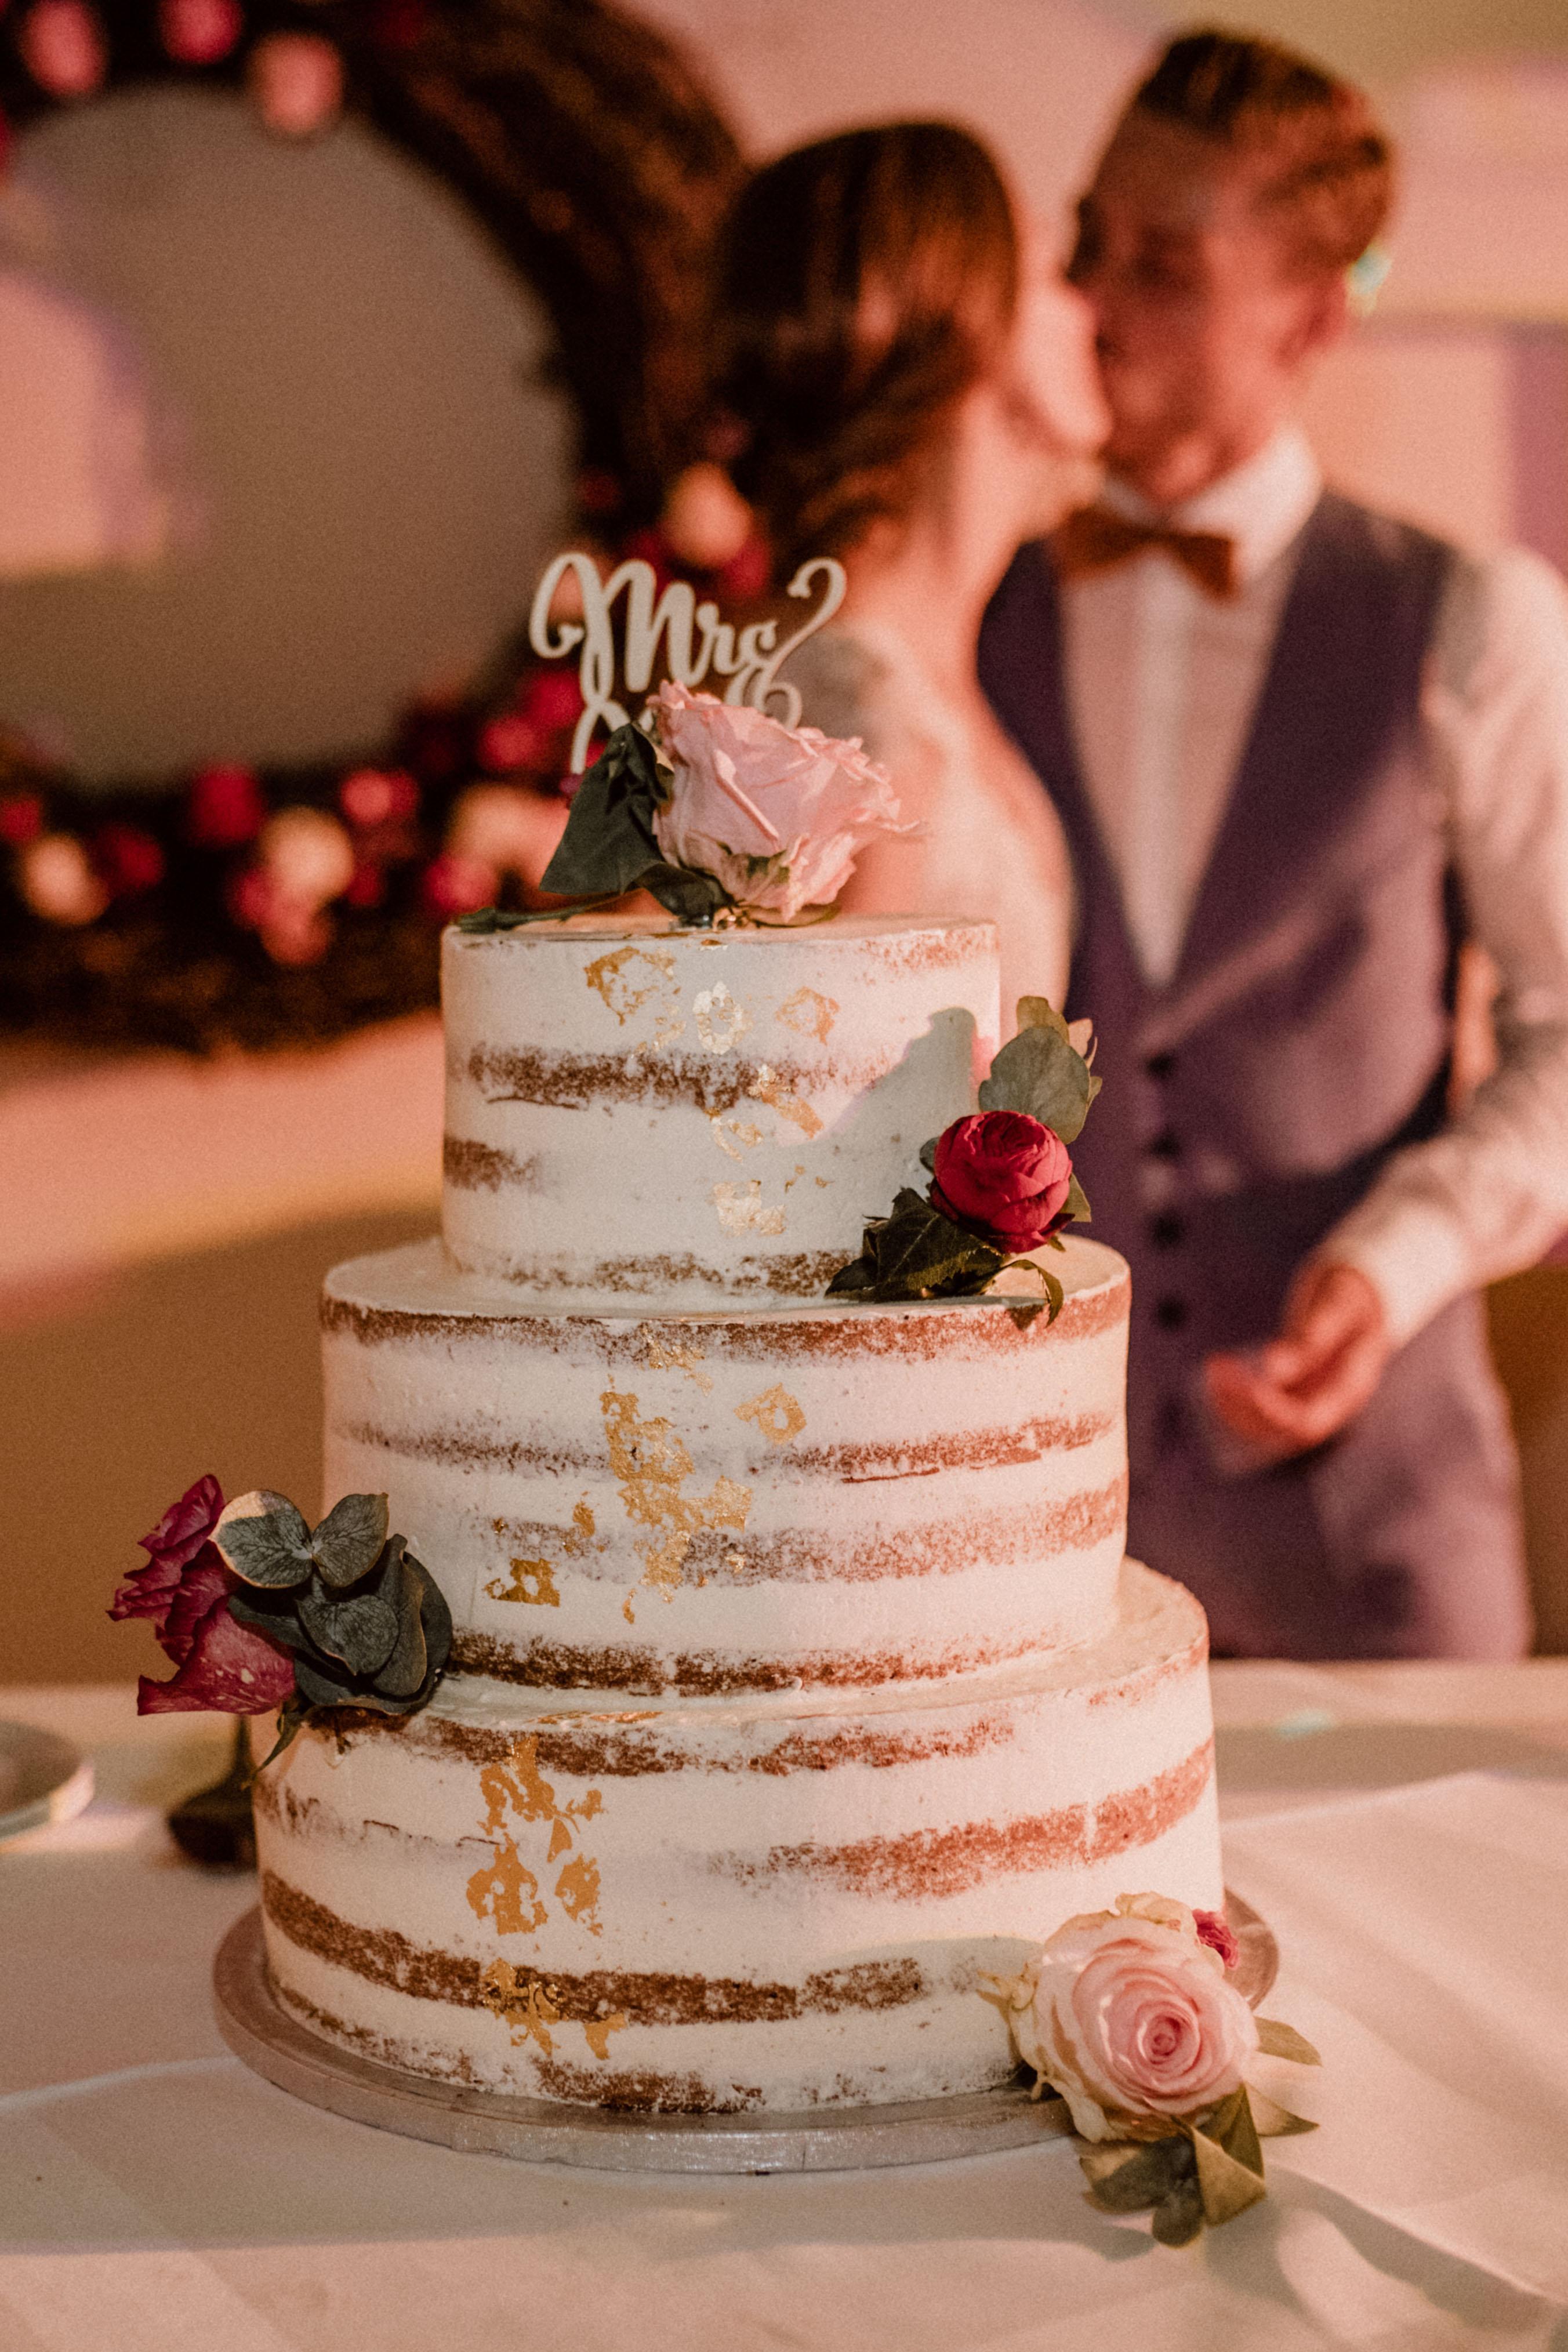 weddingcake sonja poehlmann photography wedding muenchen bayern